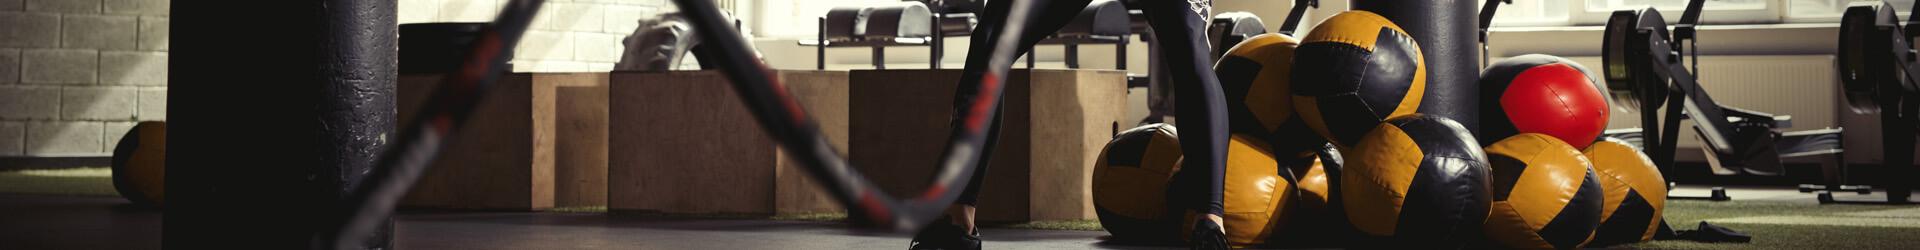 Fitness-Tipps.de - Banner